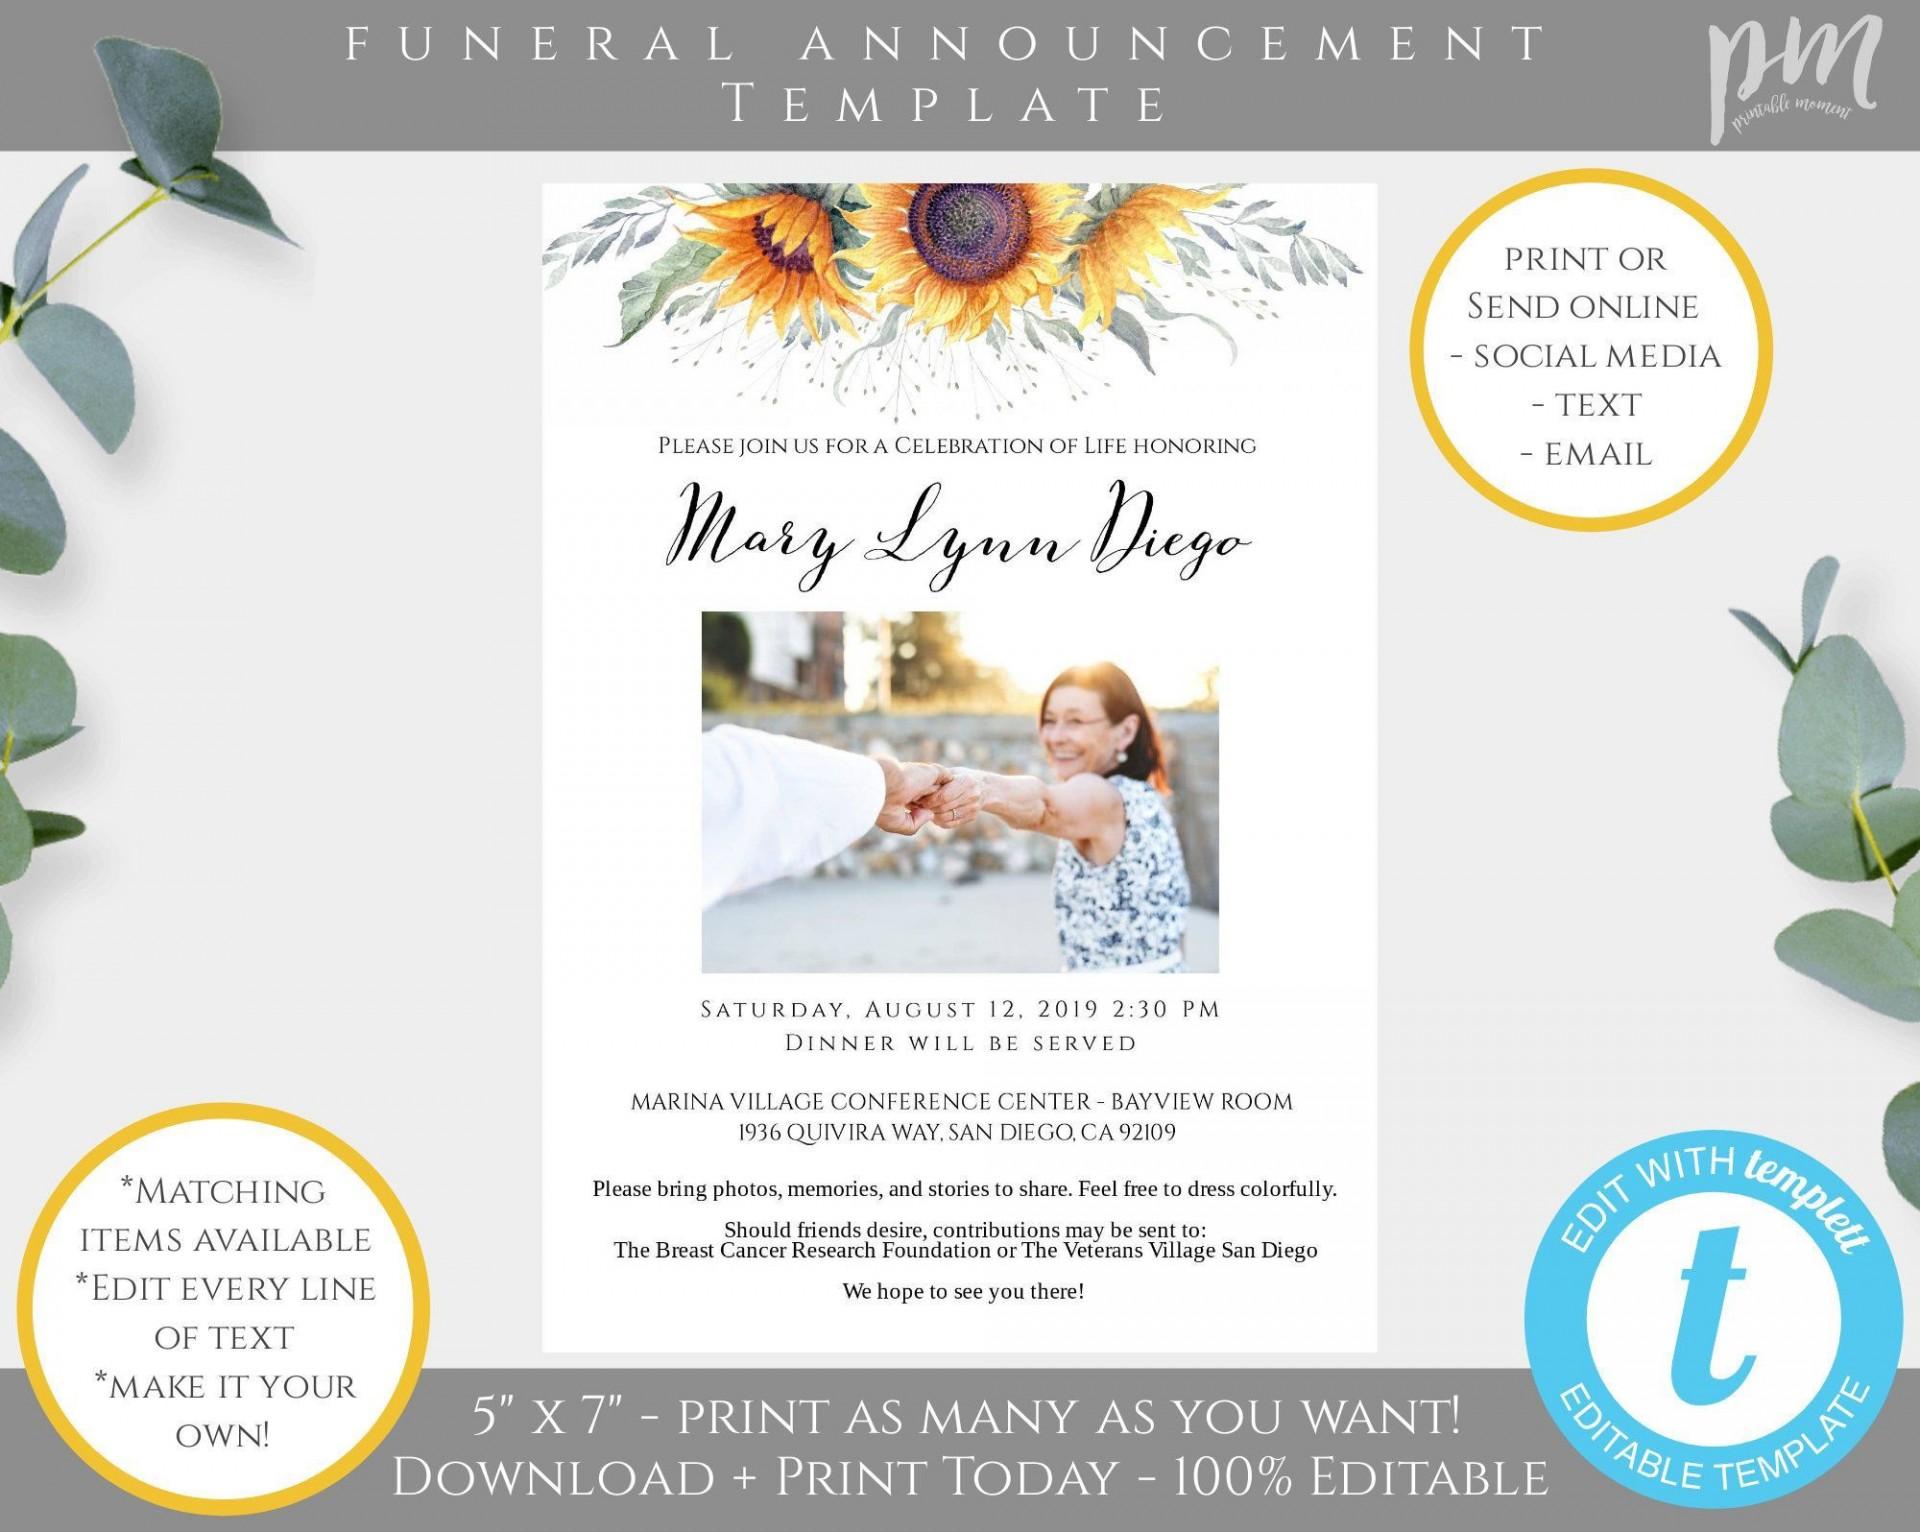 001 Beautiful Celebration Of Life Announcement Template Free Sample  Invitation Download Invite1920